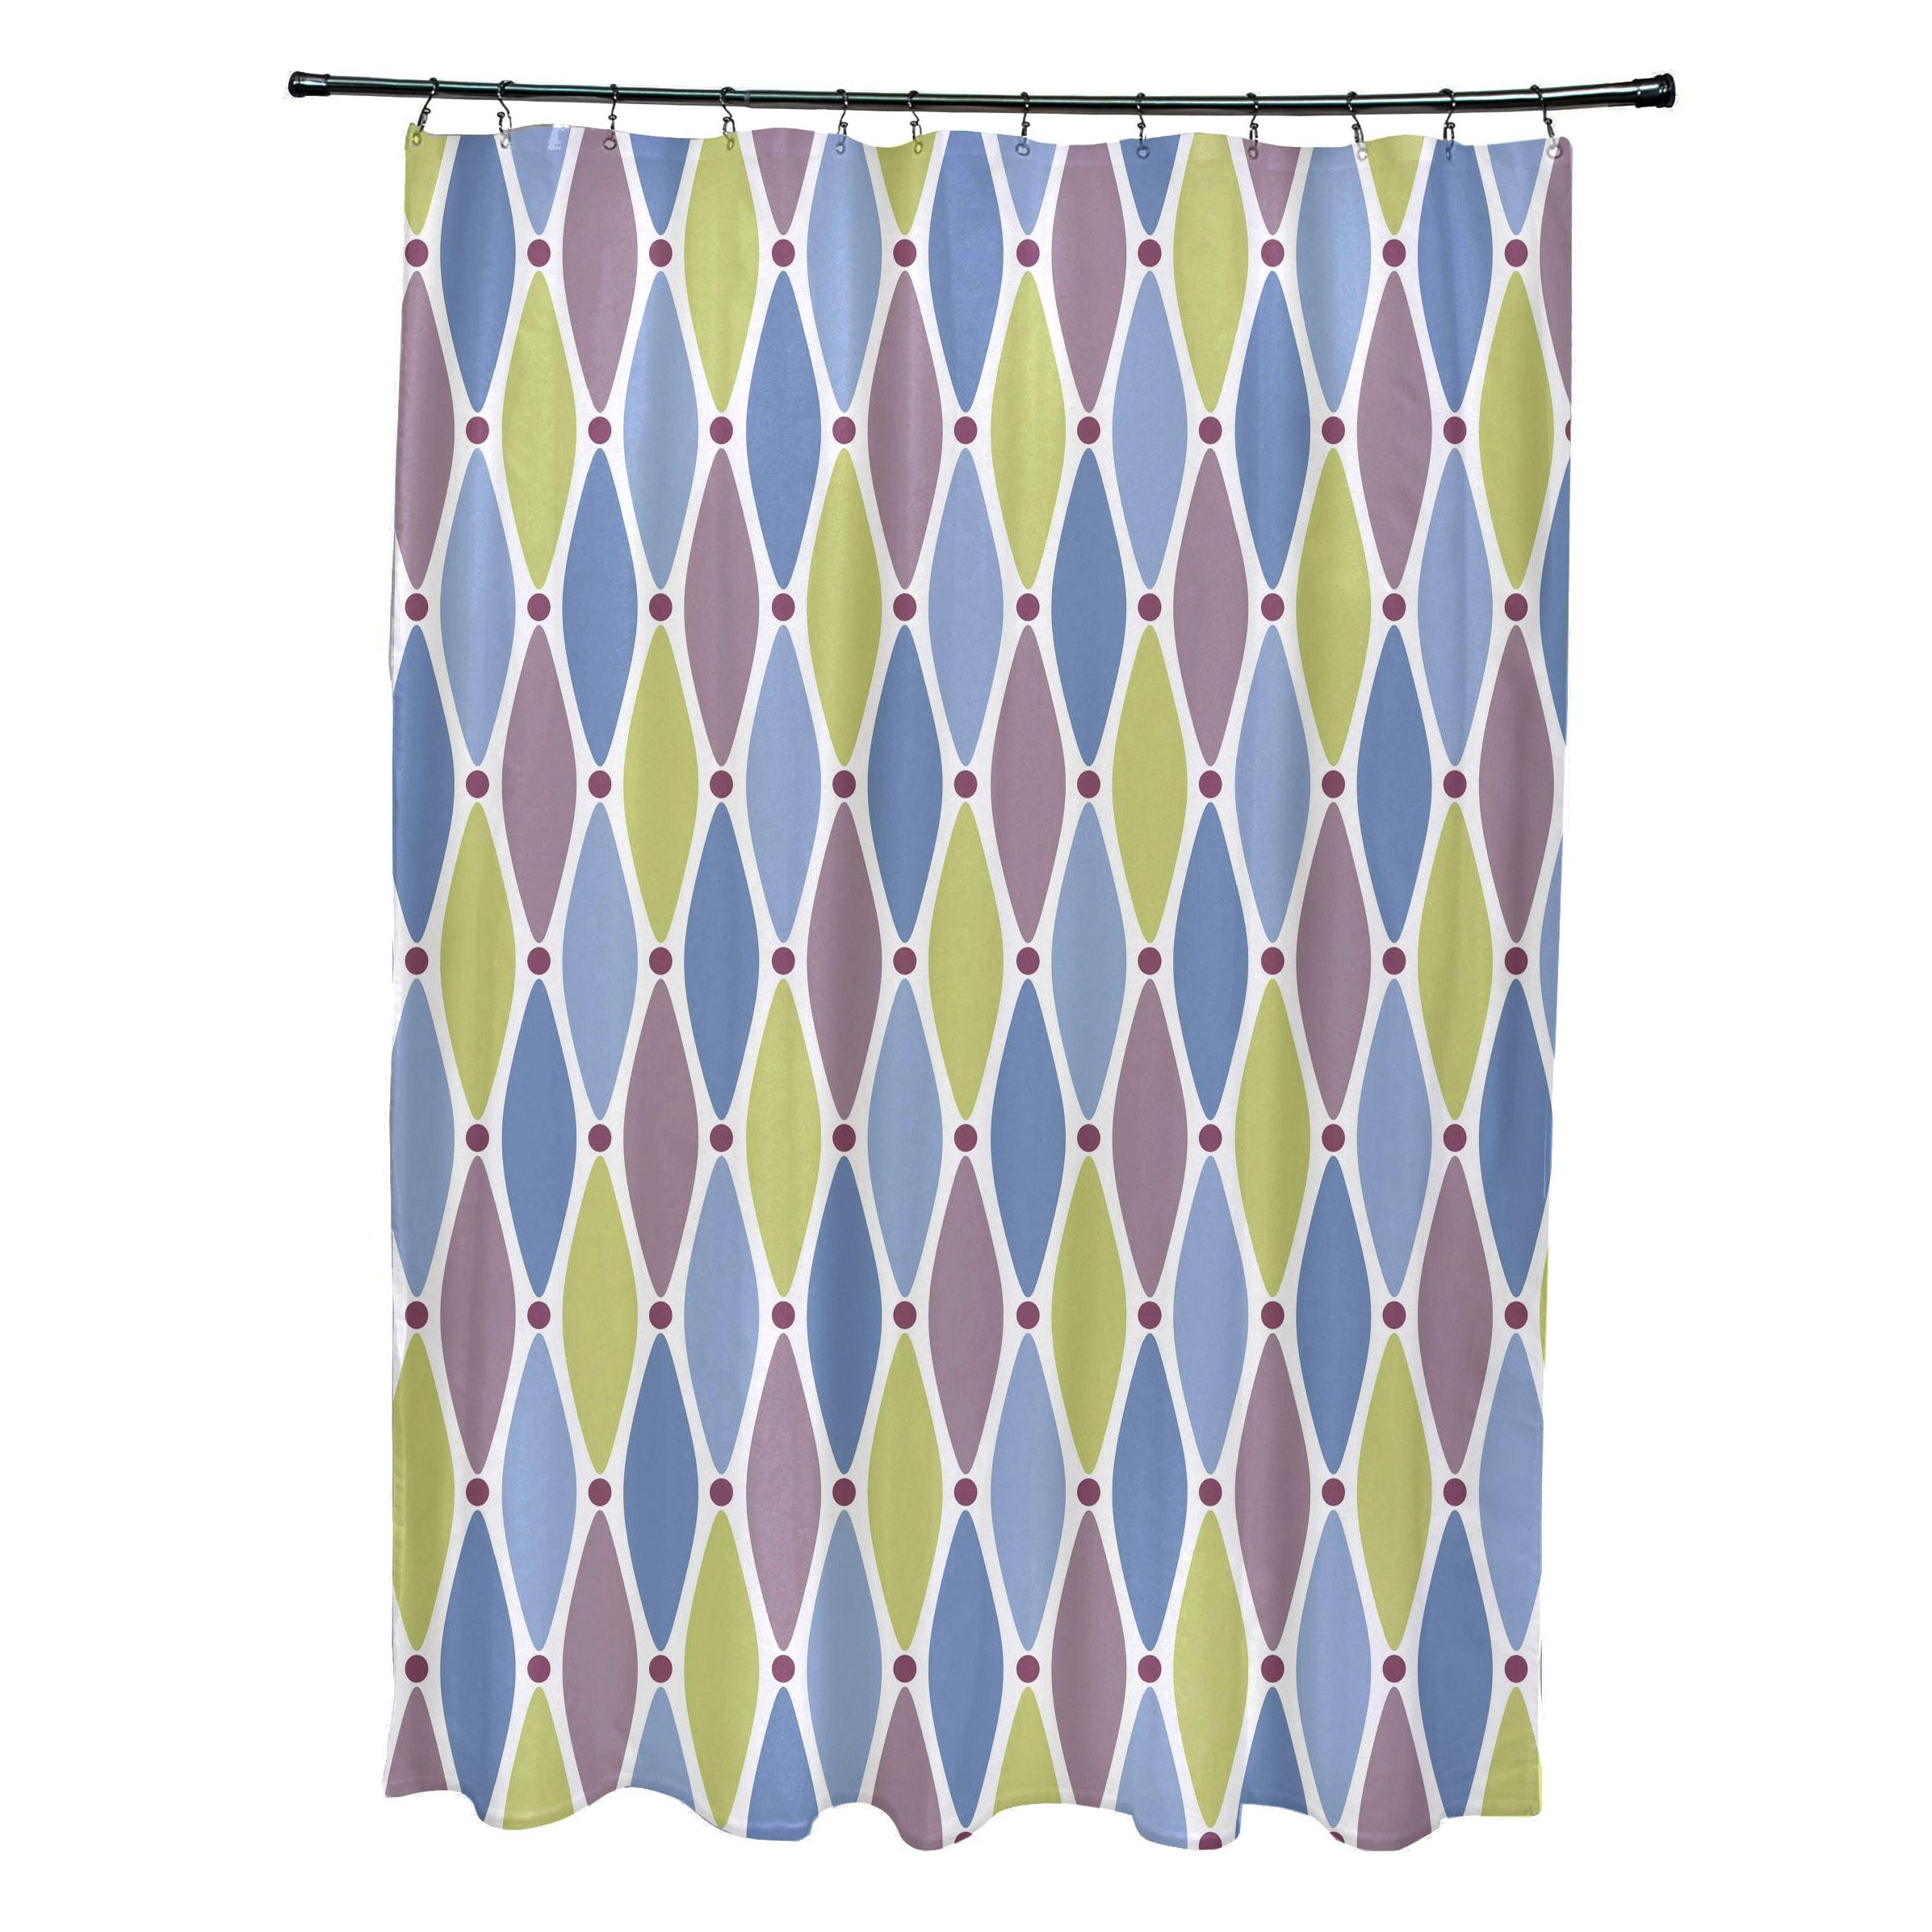 71 x 74-inch Wavy Splash Geometric Print Shower Curtain - Free ...